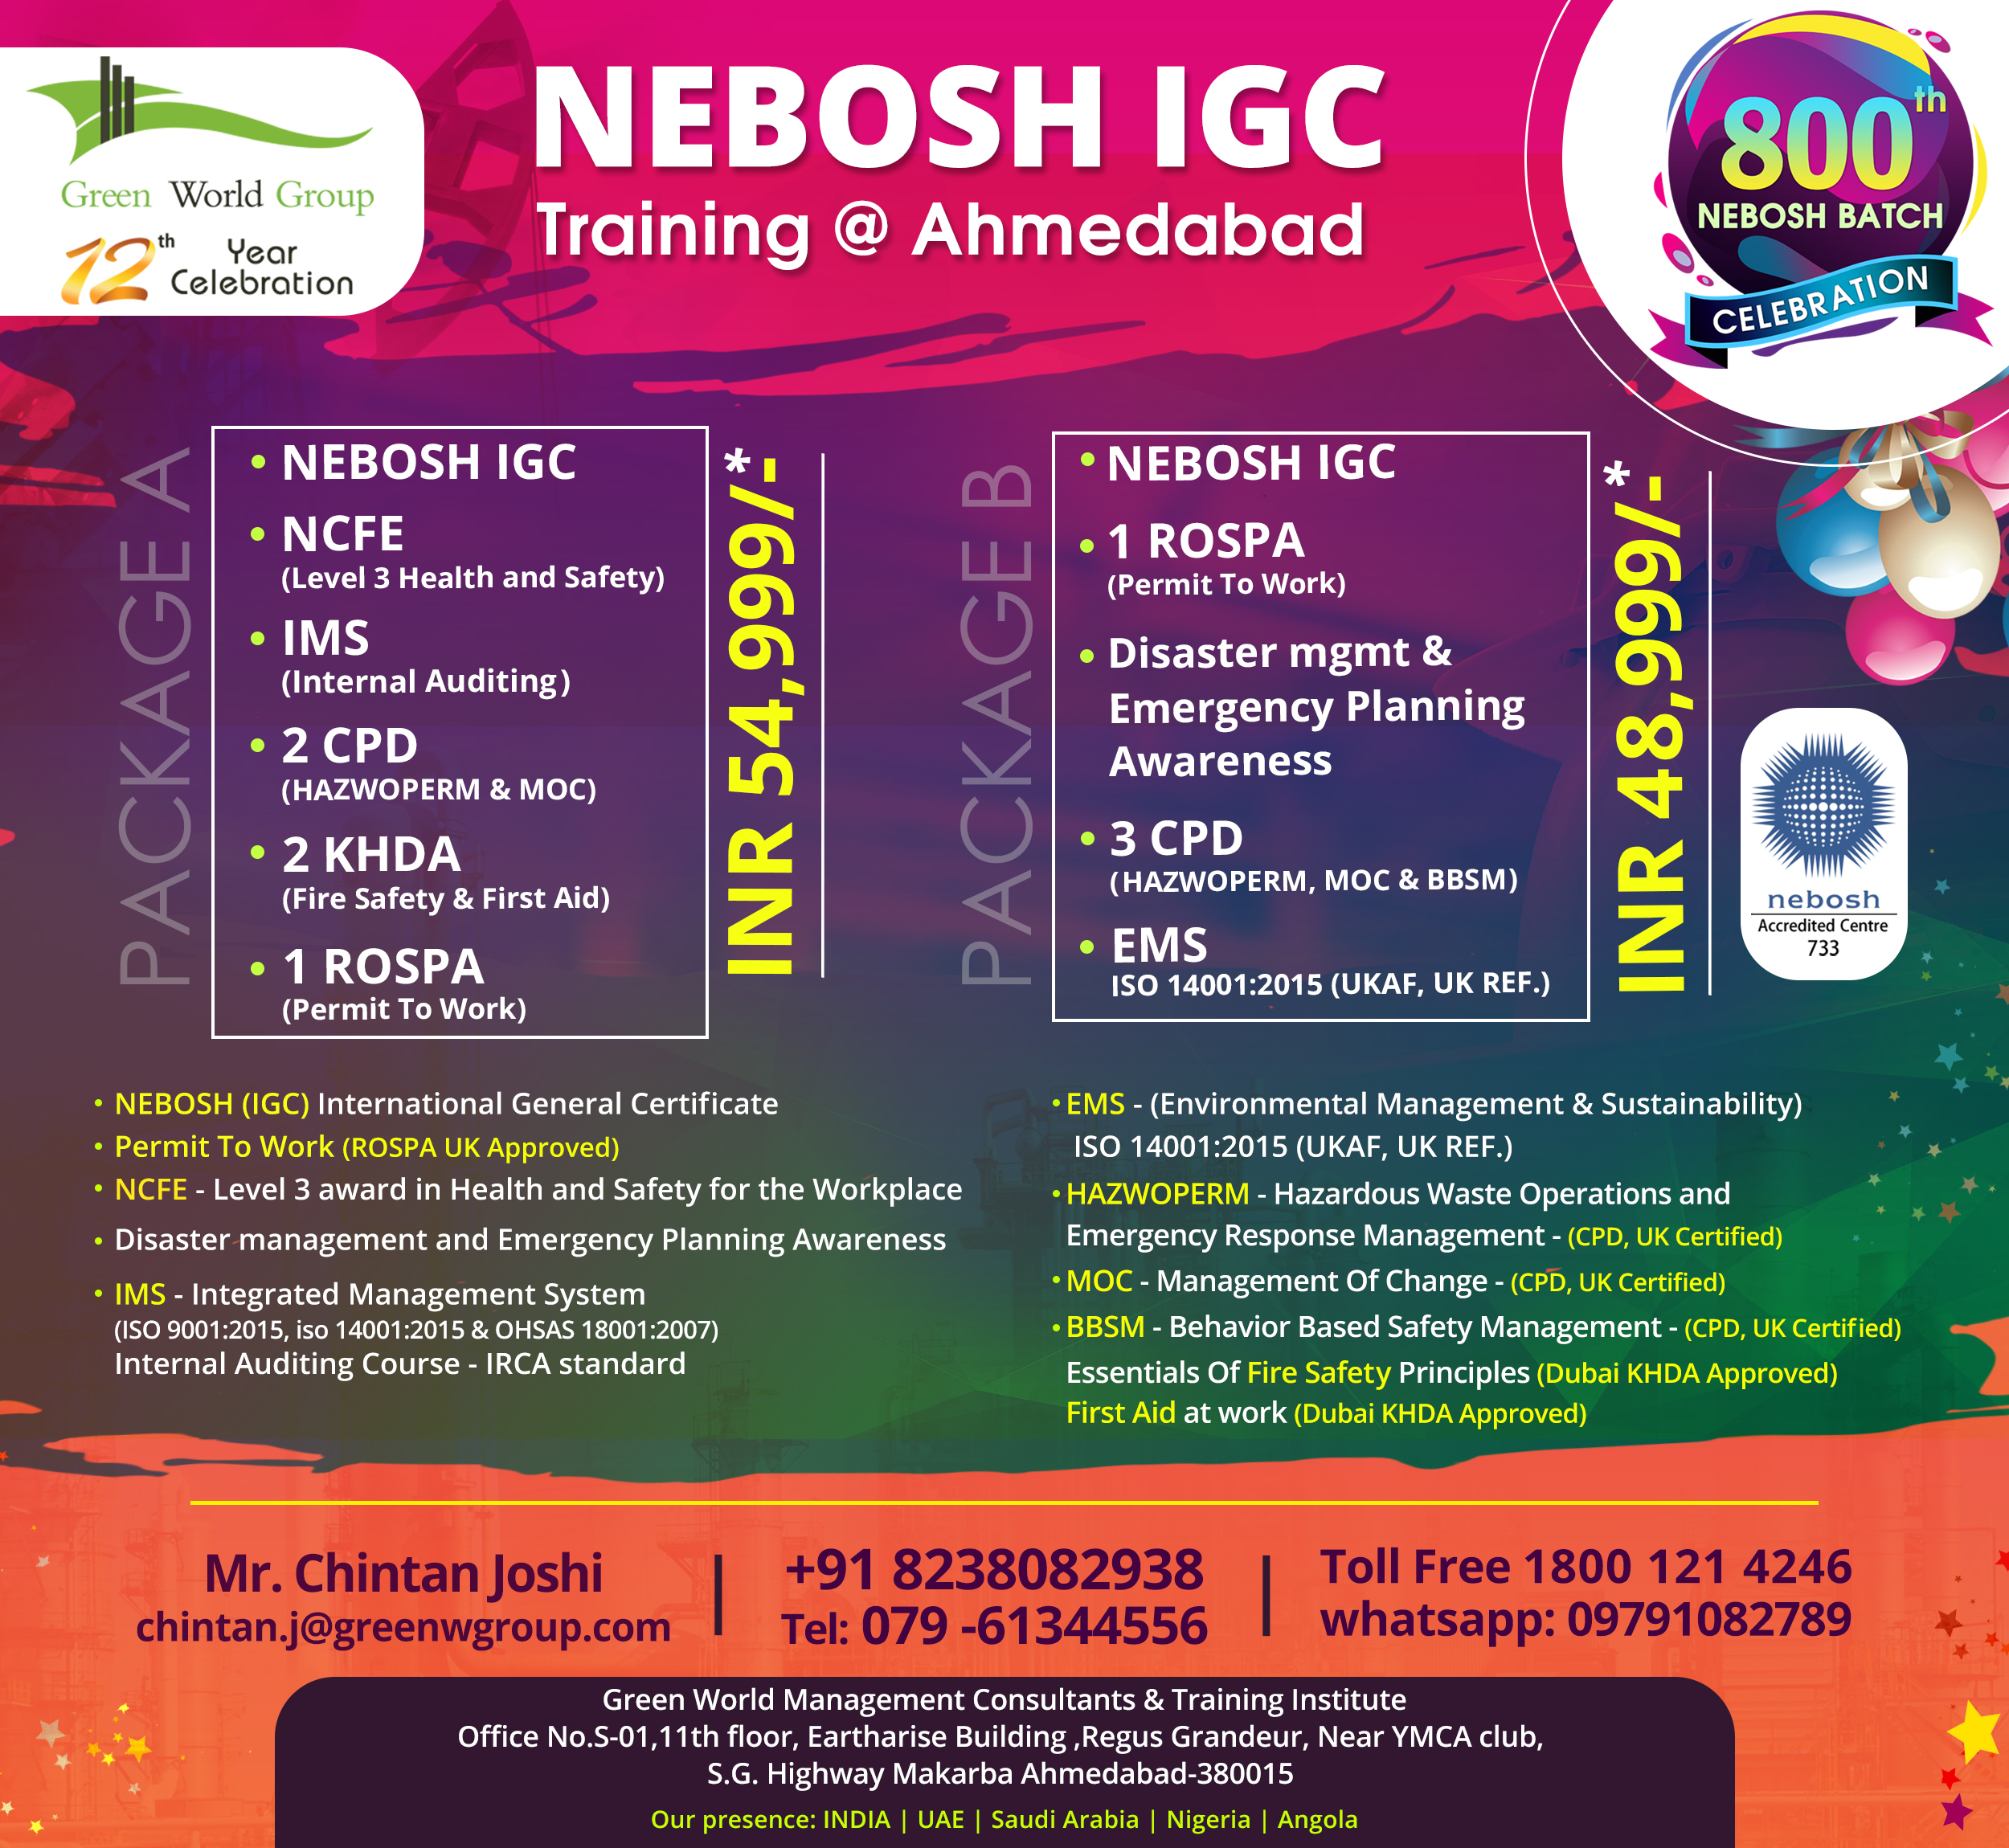 NEBOSH-IGC_800th_Batch_Ahmedabad